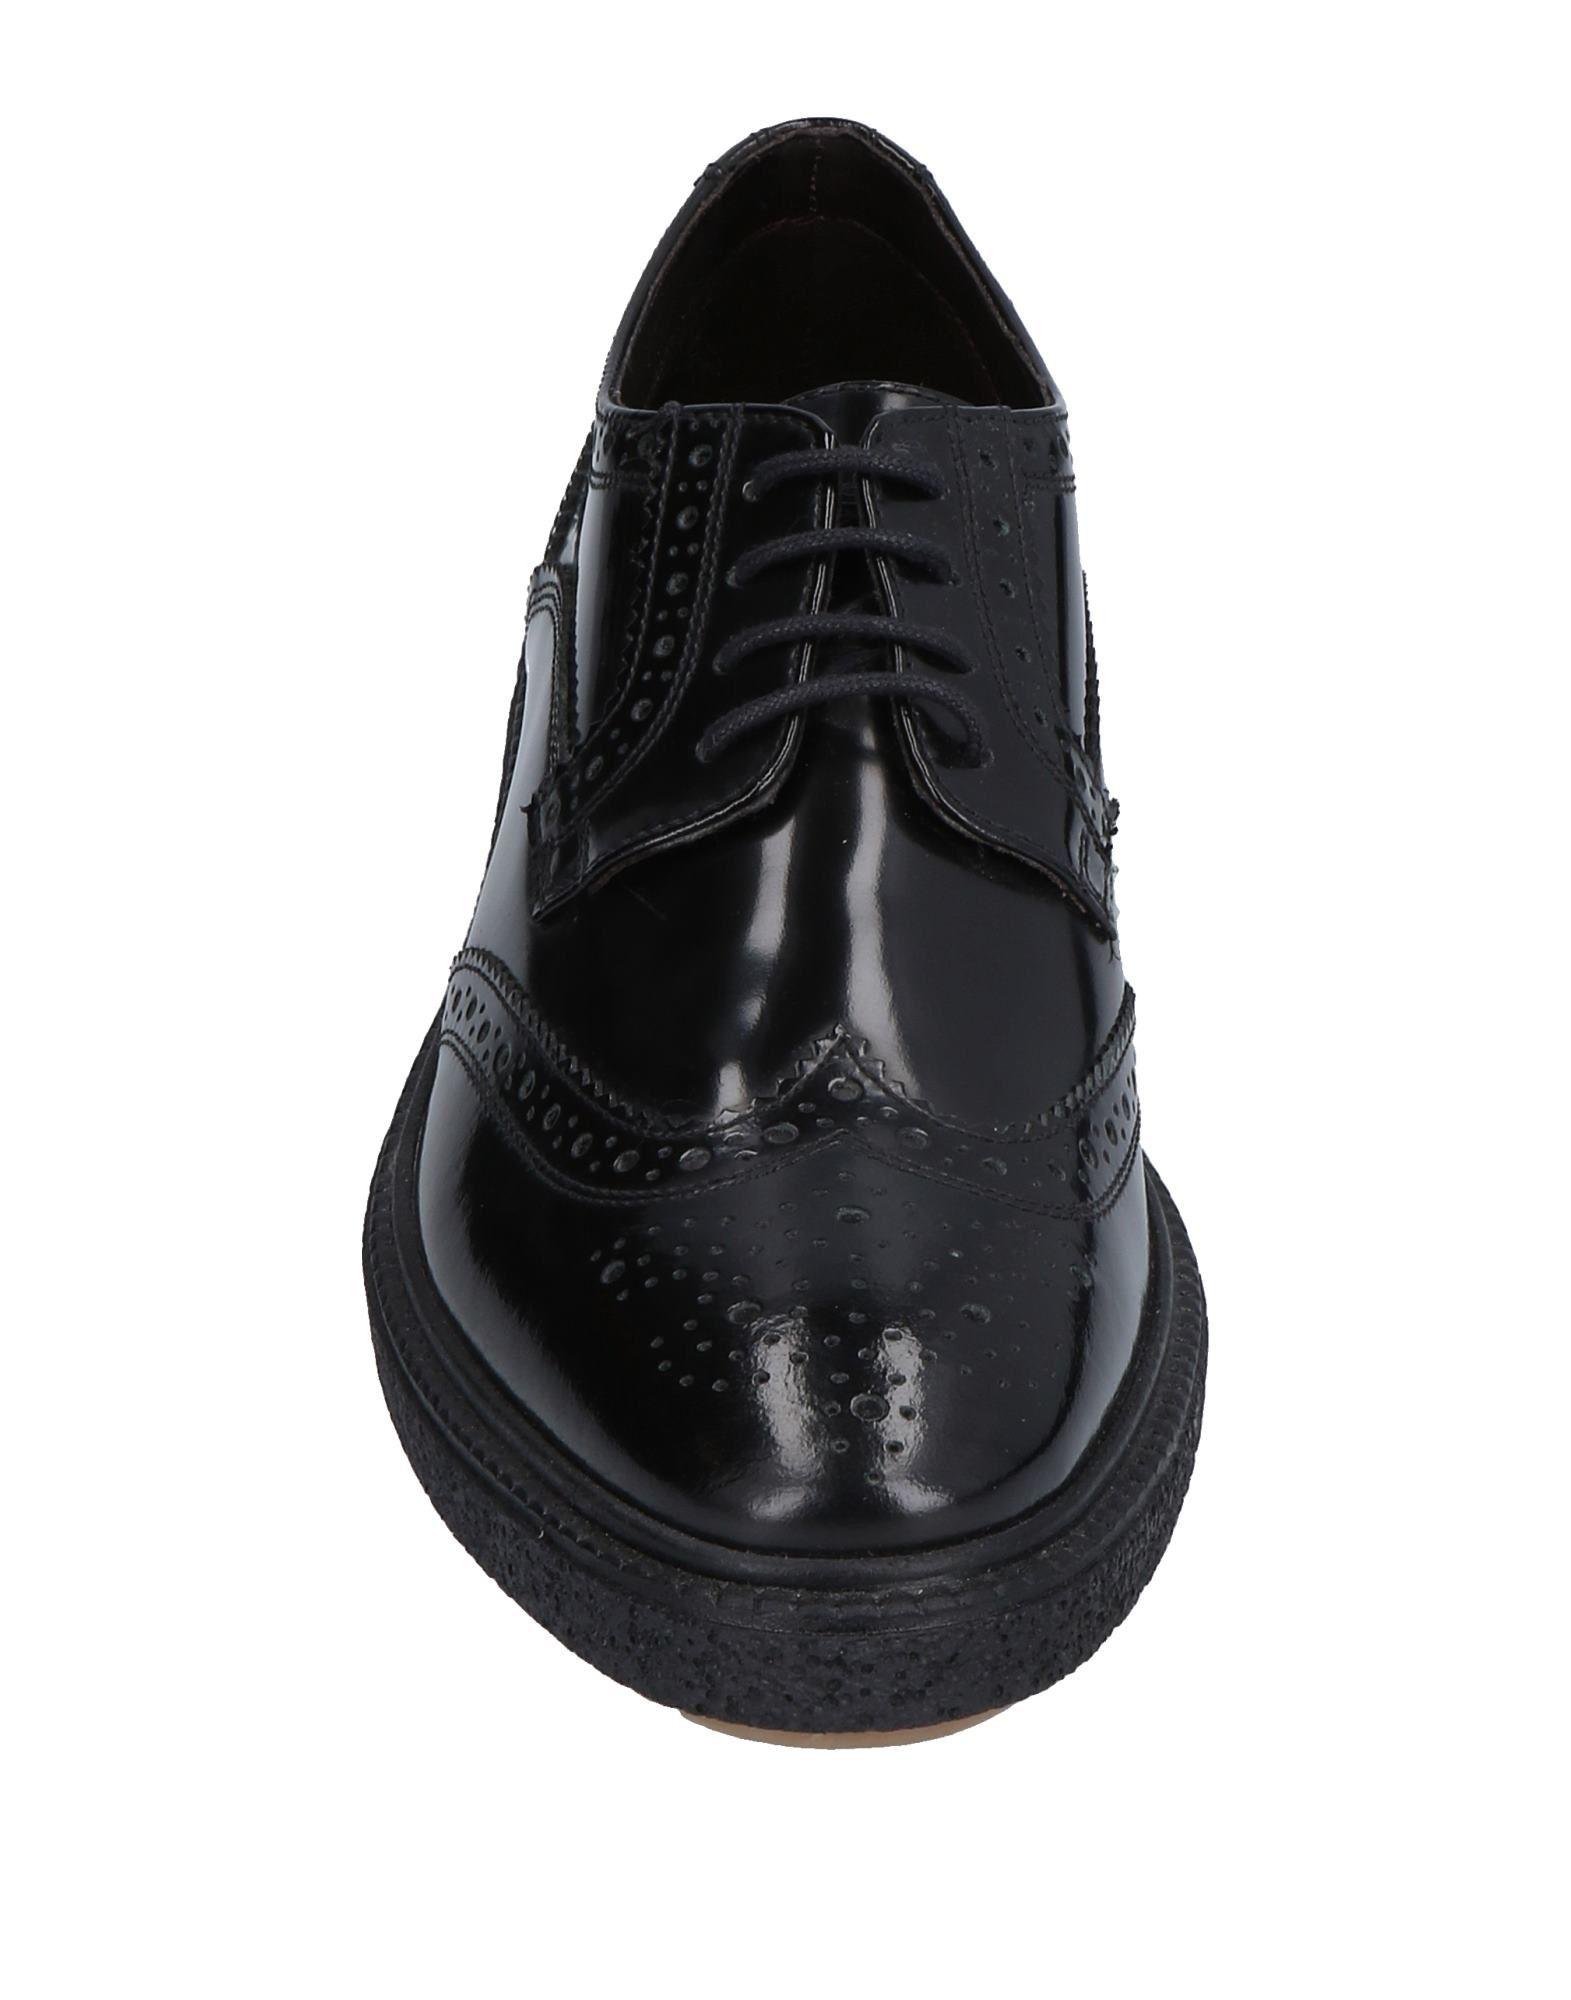 Rabatt echte Schuhe Base  11516198VK London Schnürschuhe Herren  11516198VK  a5fa7a